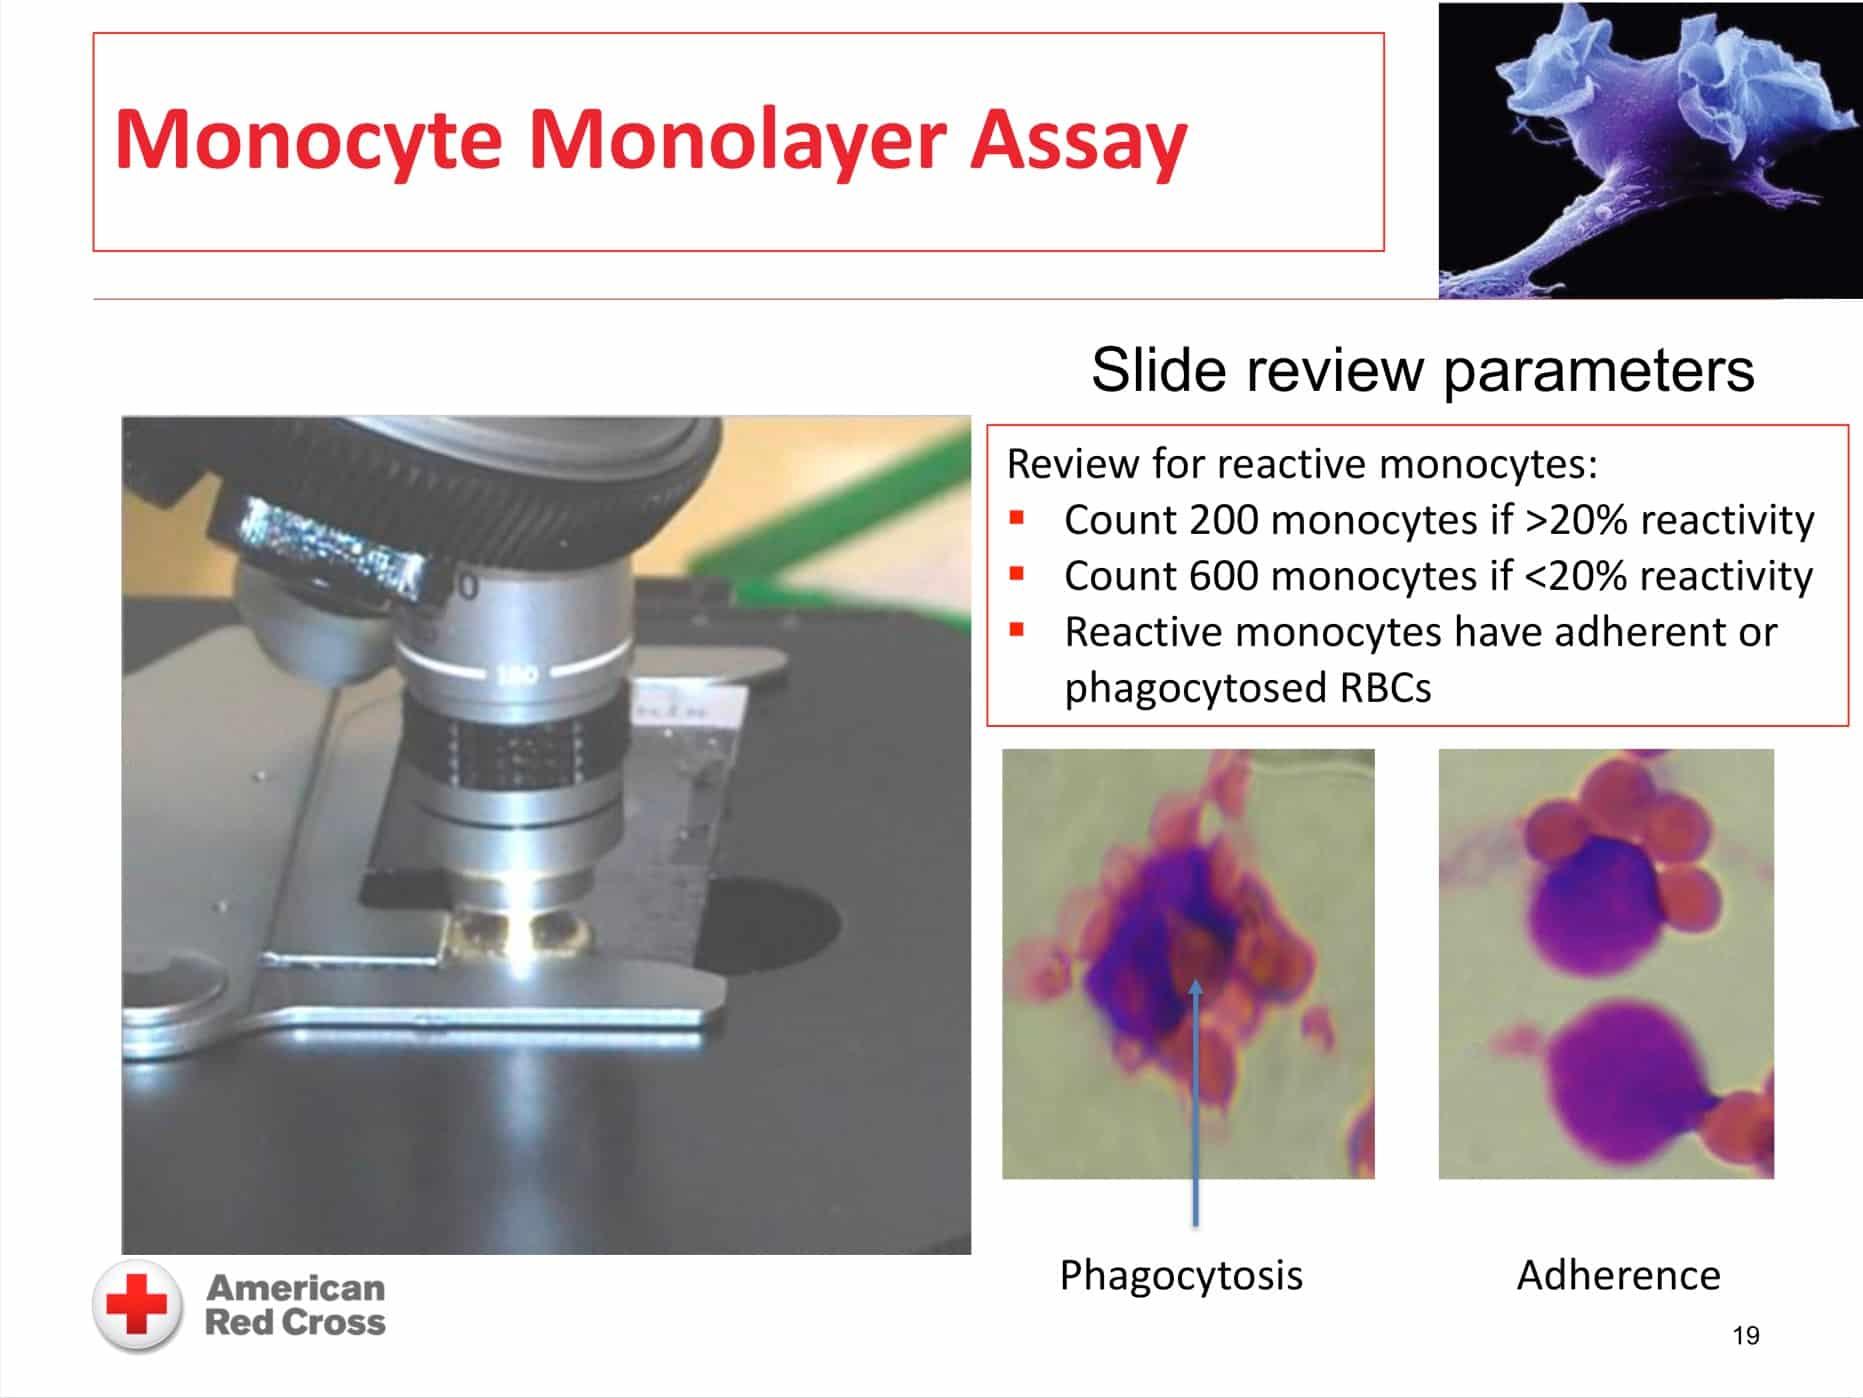 Monocyte monolayer assay image 6